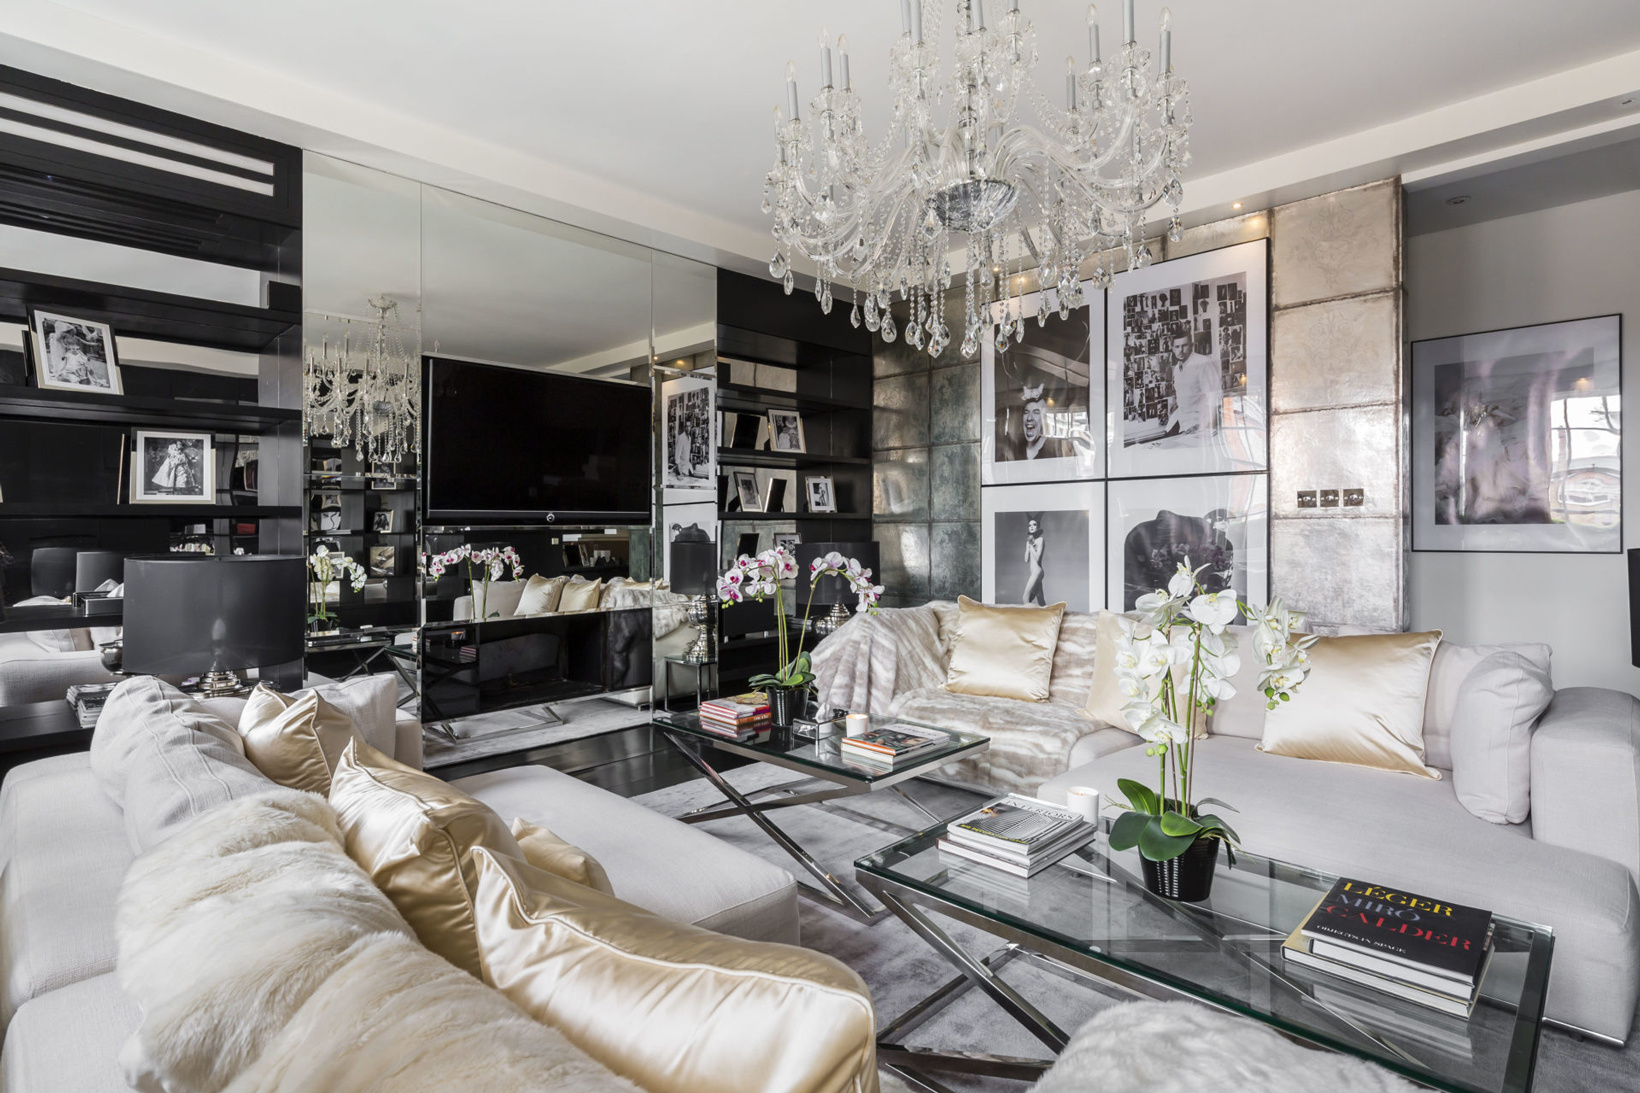 Take A Sneak Peek Into Alexander McQueen's London Penthouse